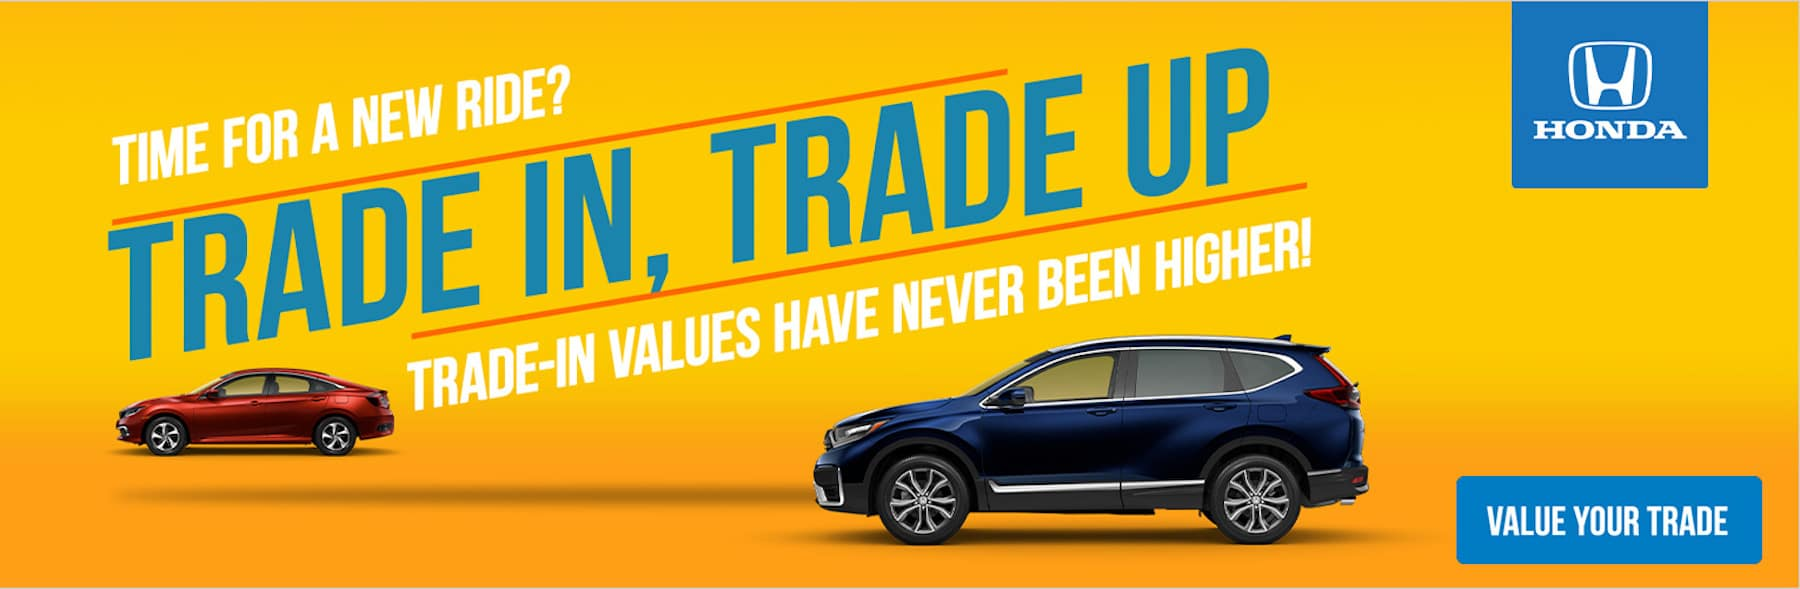 1920x500_21041_Honda-Trading-In_DAA-CTROT 1